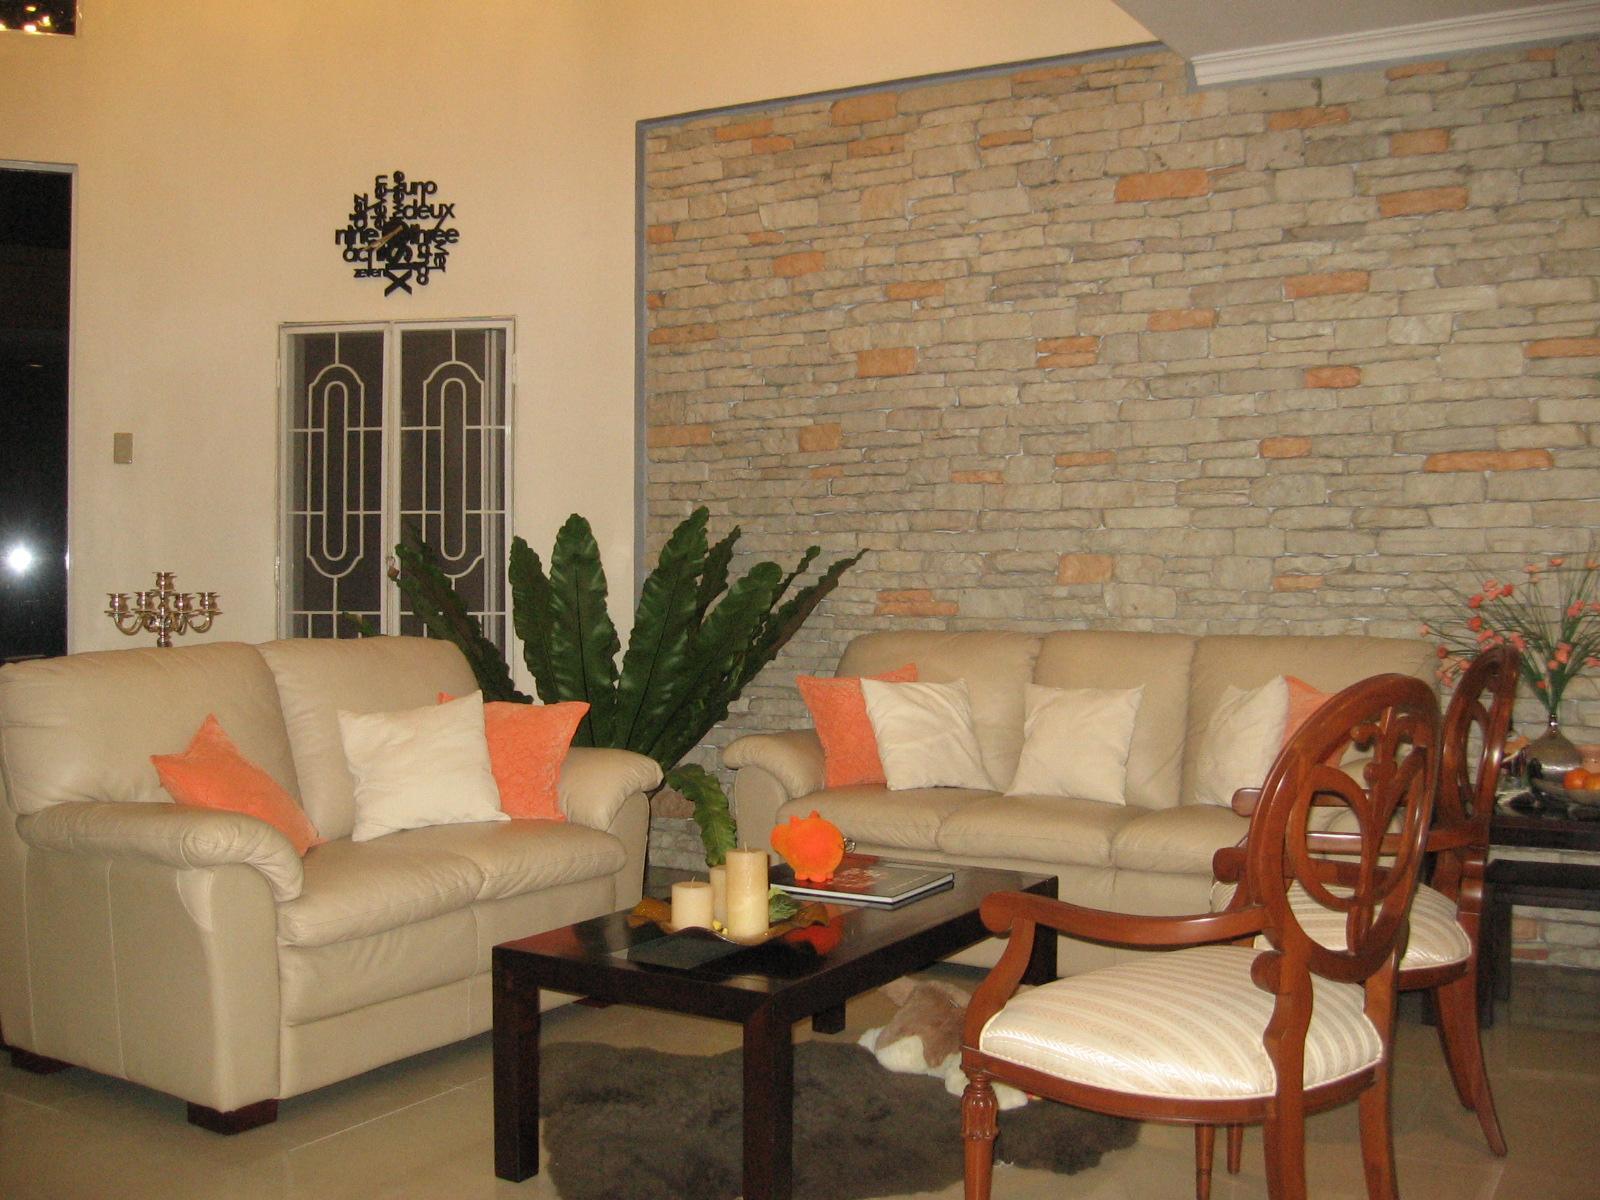 4-bedroom-furnished-house-in-vista-grande-subdivision-talisay-city-cebu